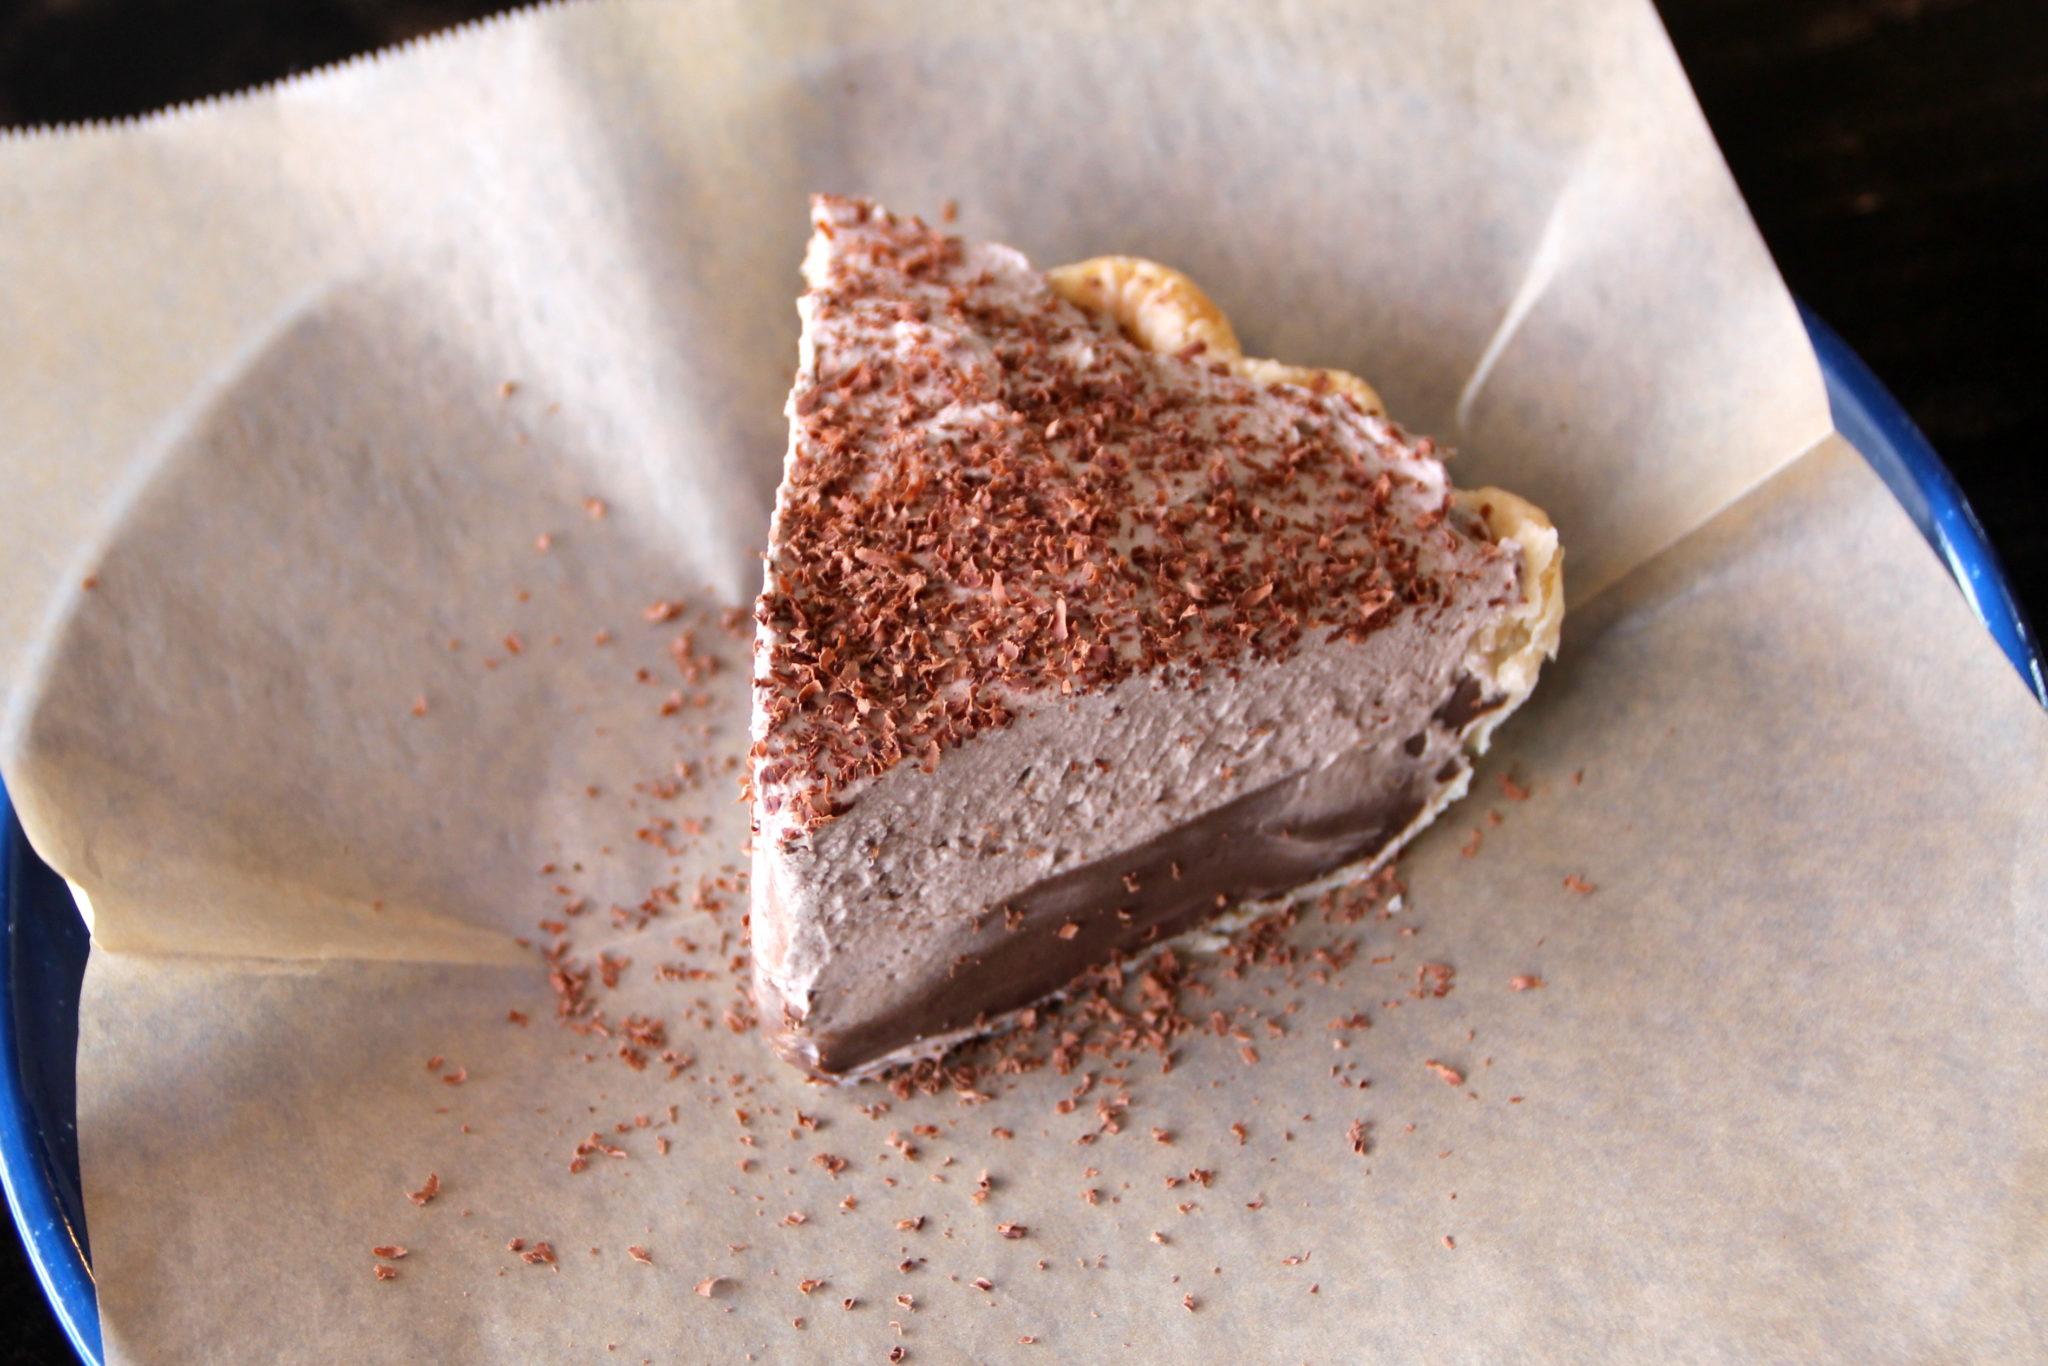 conway-cross-creek-sandwich-shop-chocolate-cream-pie-by-kat-robinson-1.jpg